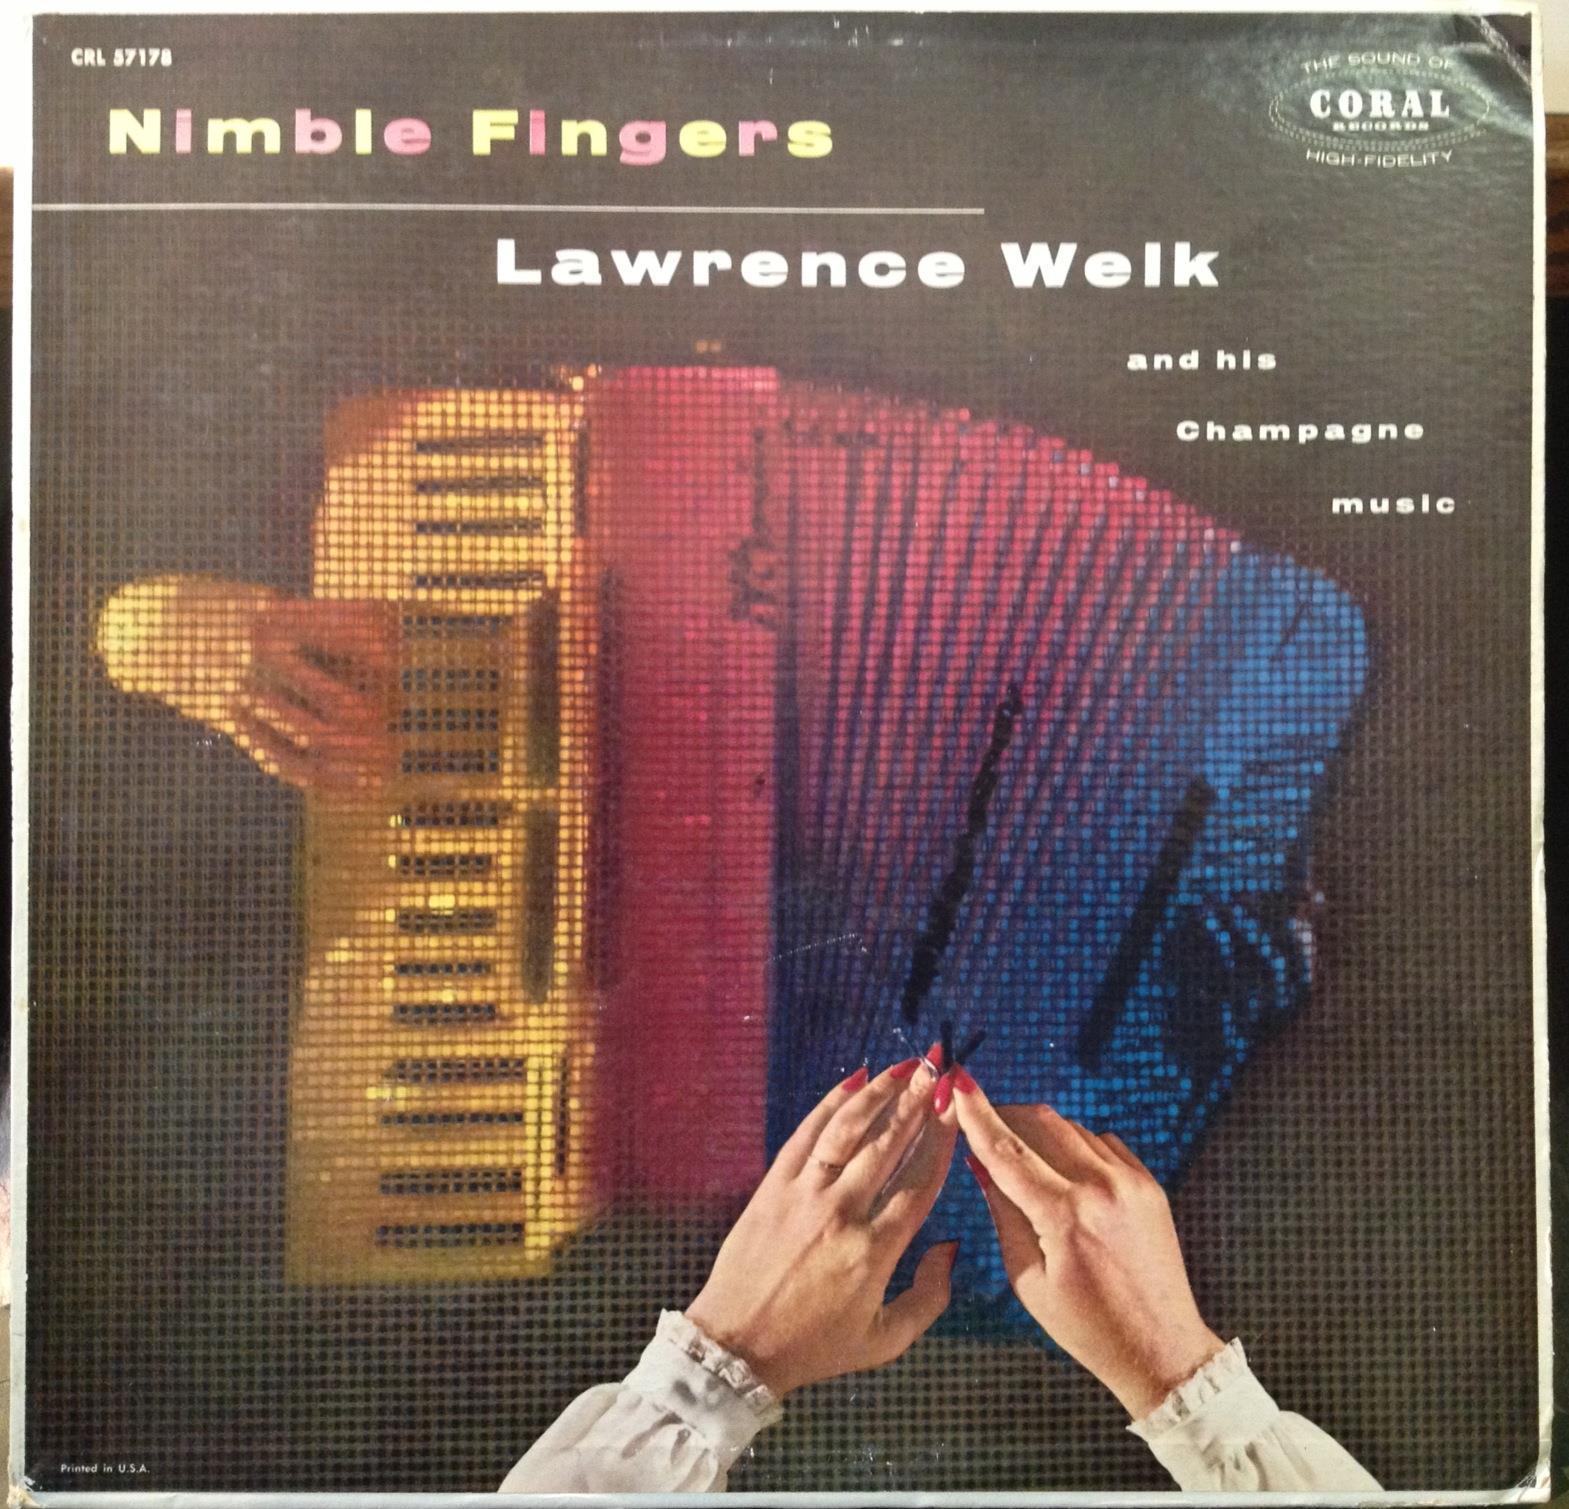 LAWRENCE WELK - Lawrence Welk Nimble Fingers Lp Vg+ Crl 57178 Vinyl 1957 Record (nimble Fingers)